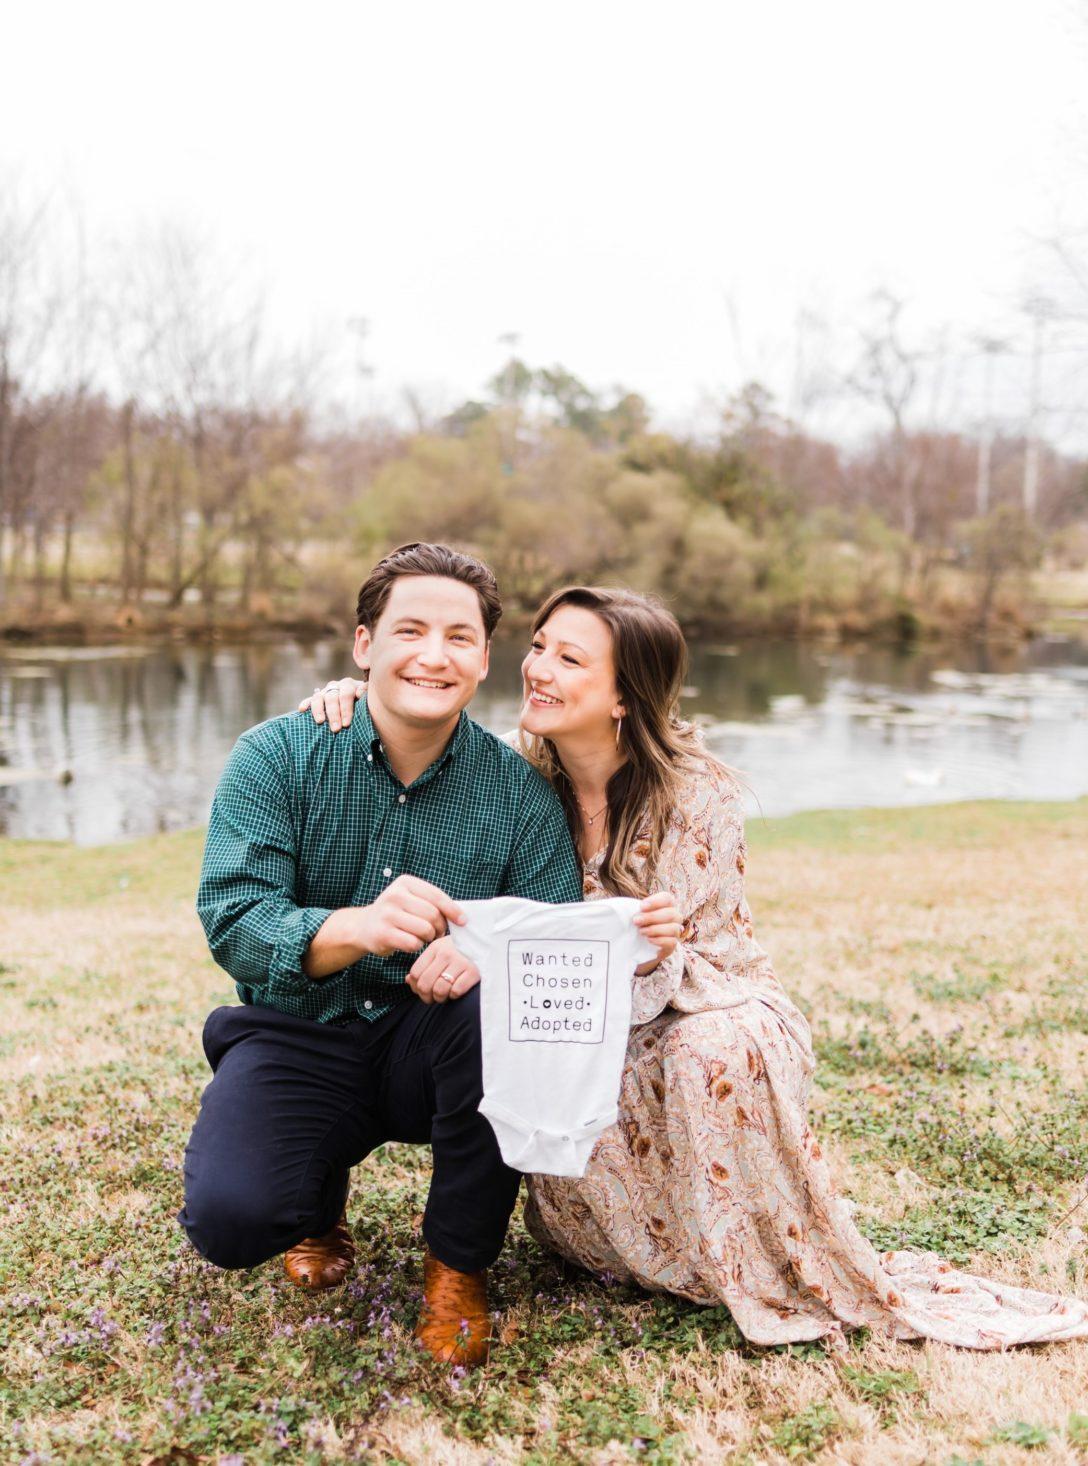 Amanda Dunn Adoption Photo